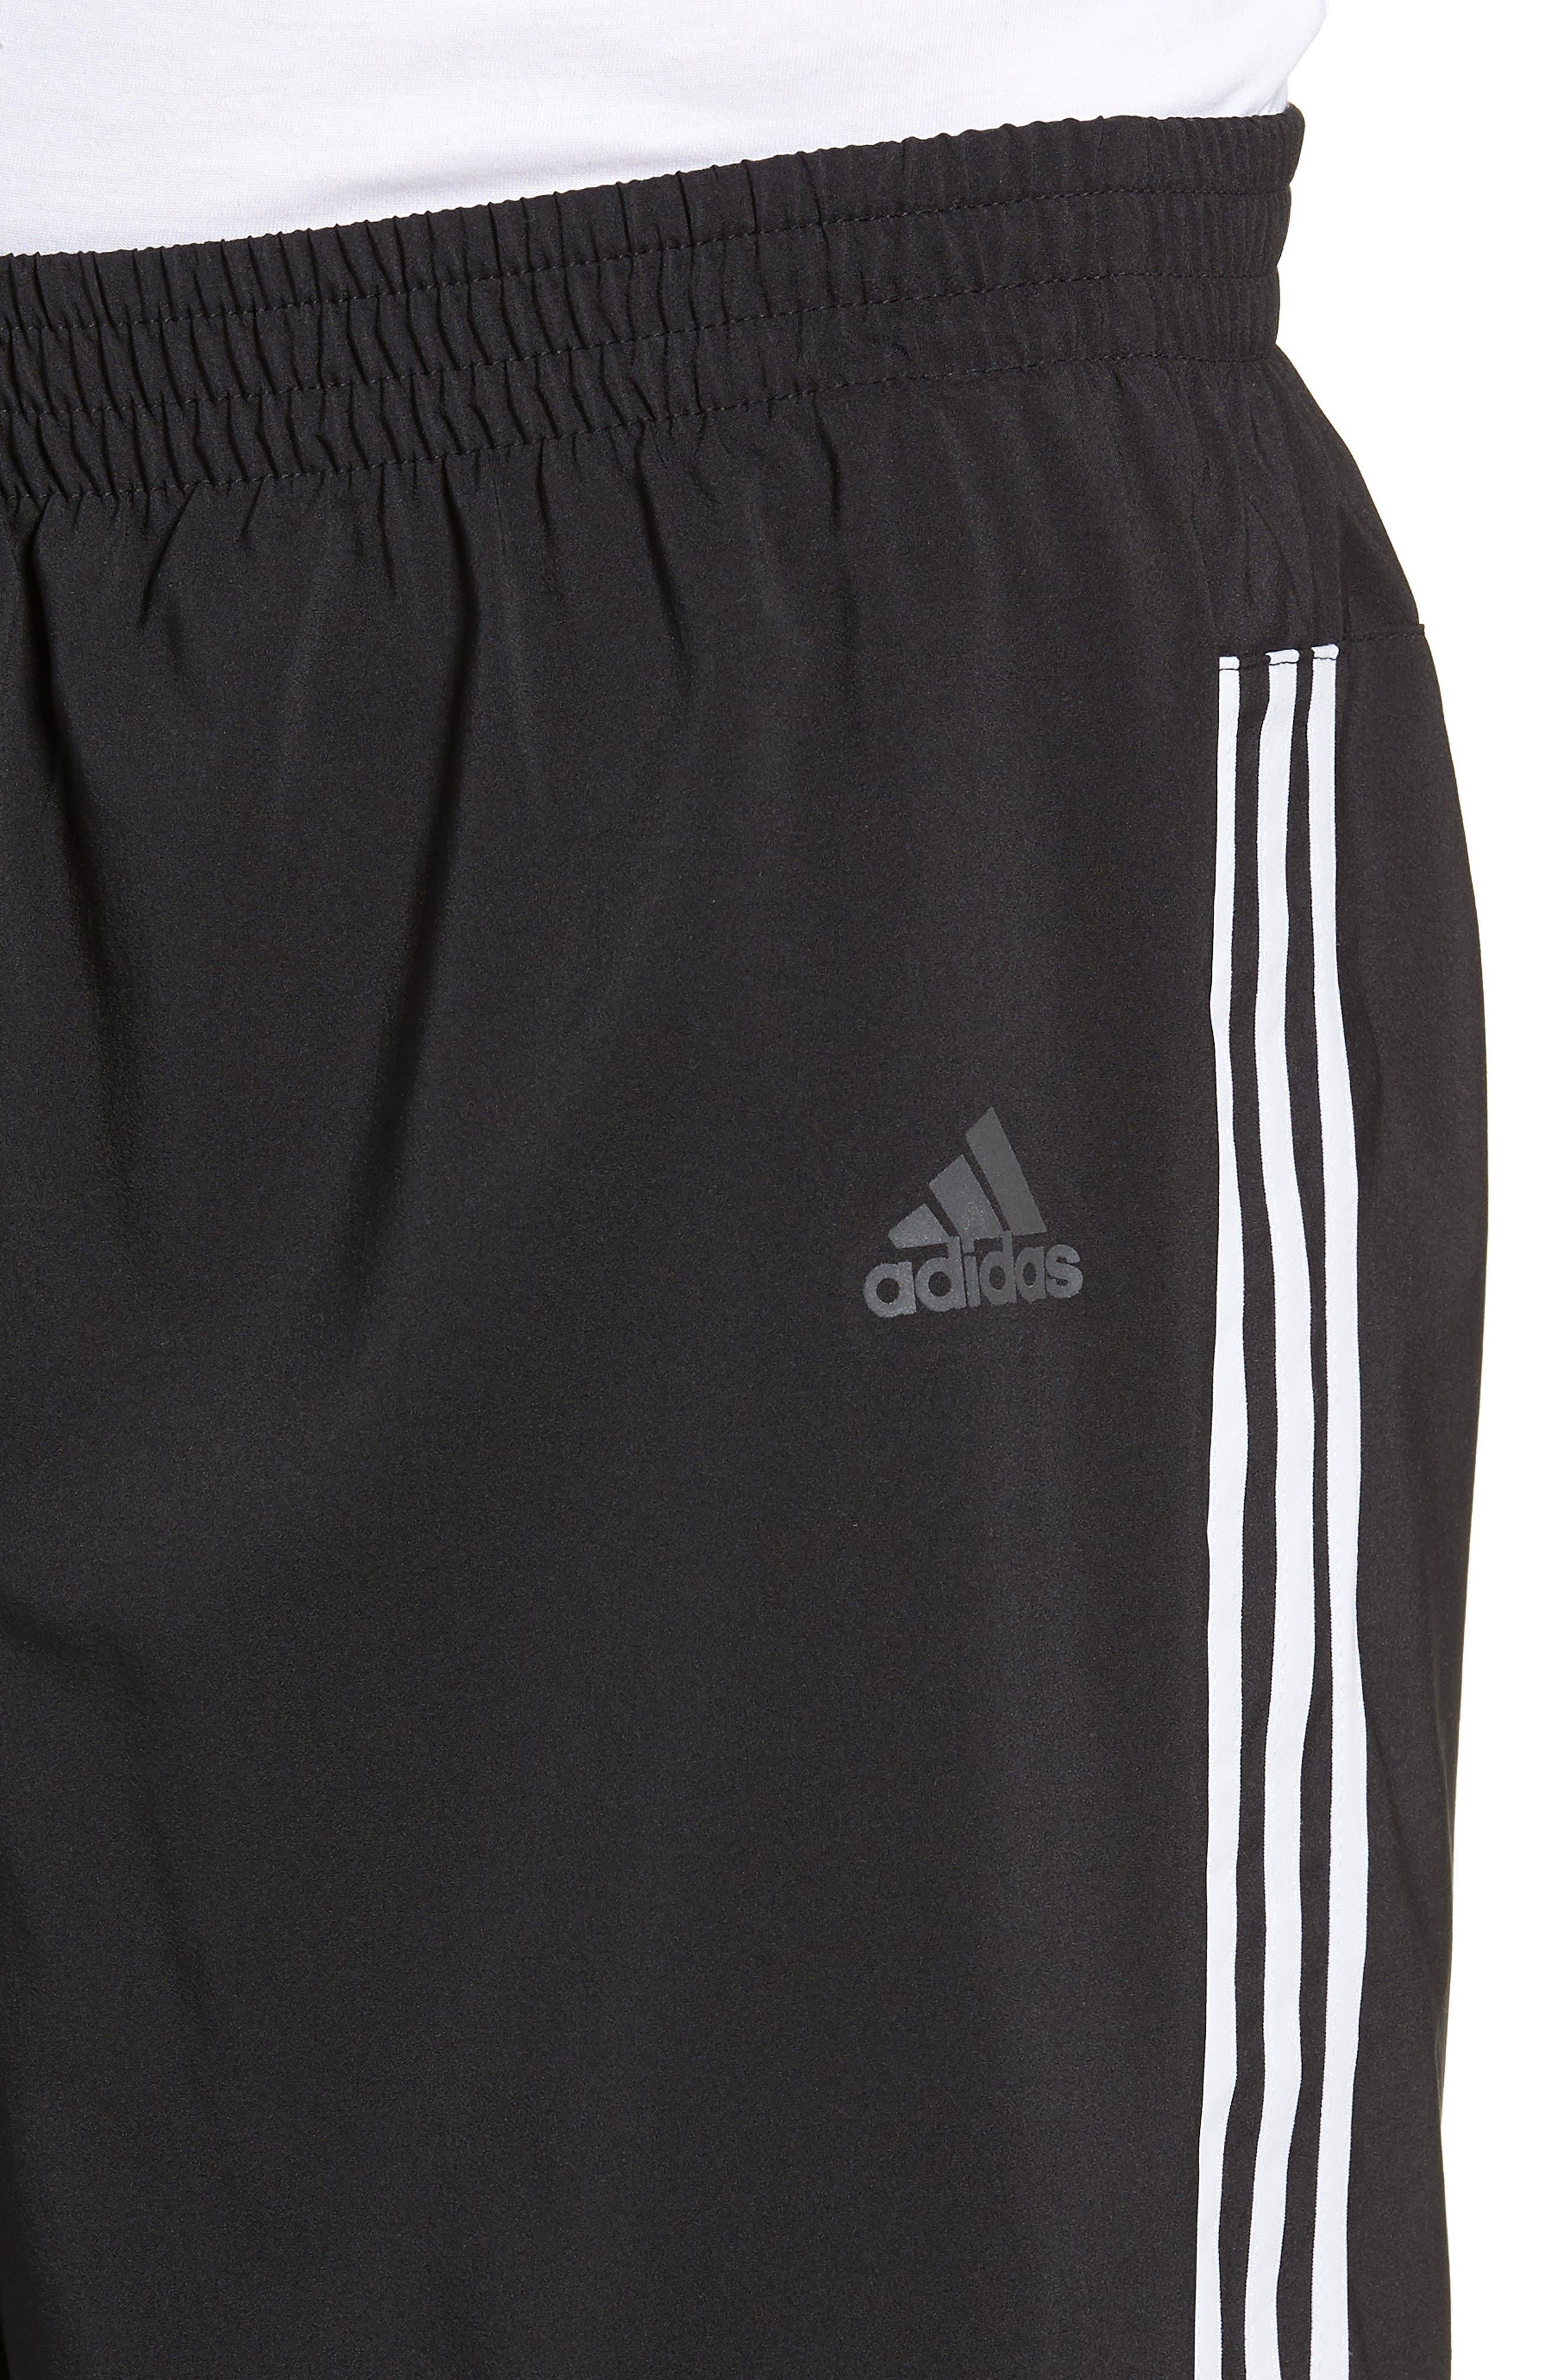 Run 3S Regular Fit Shorts,                             Alternate thumbnail 4, color,                             001